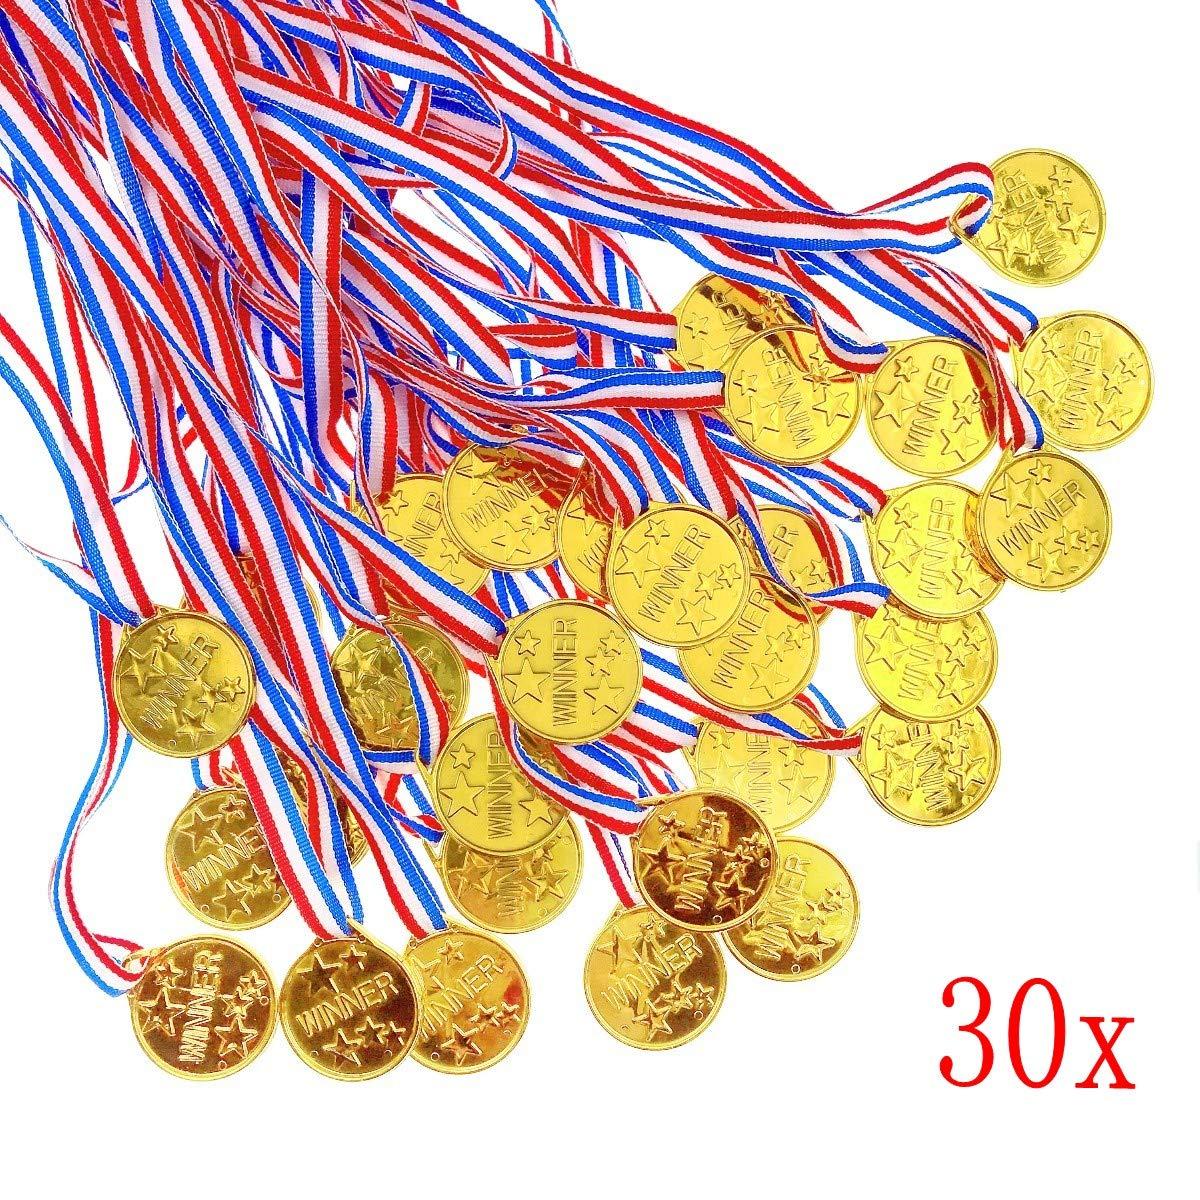 adelstitel kaufen.com JZK 20 x Giocattolo medaglia Oro plastica ...